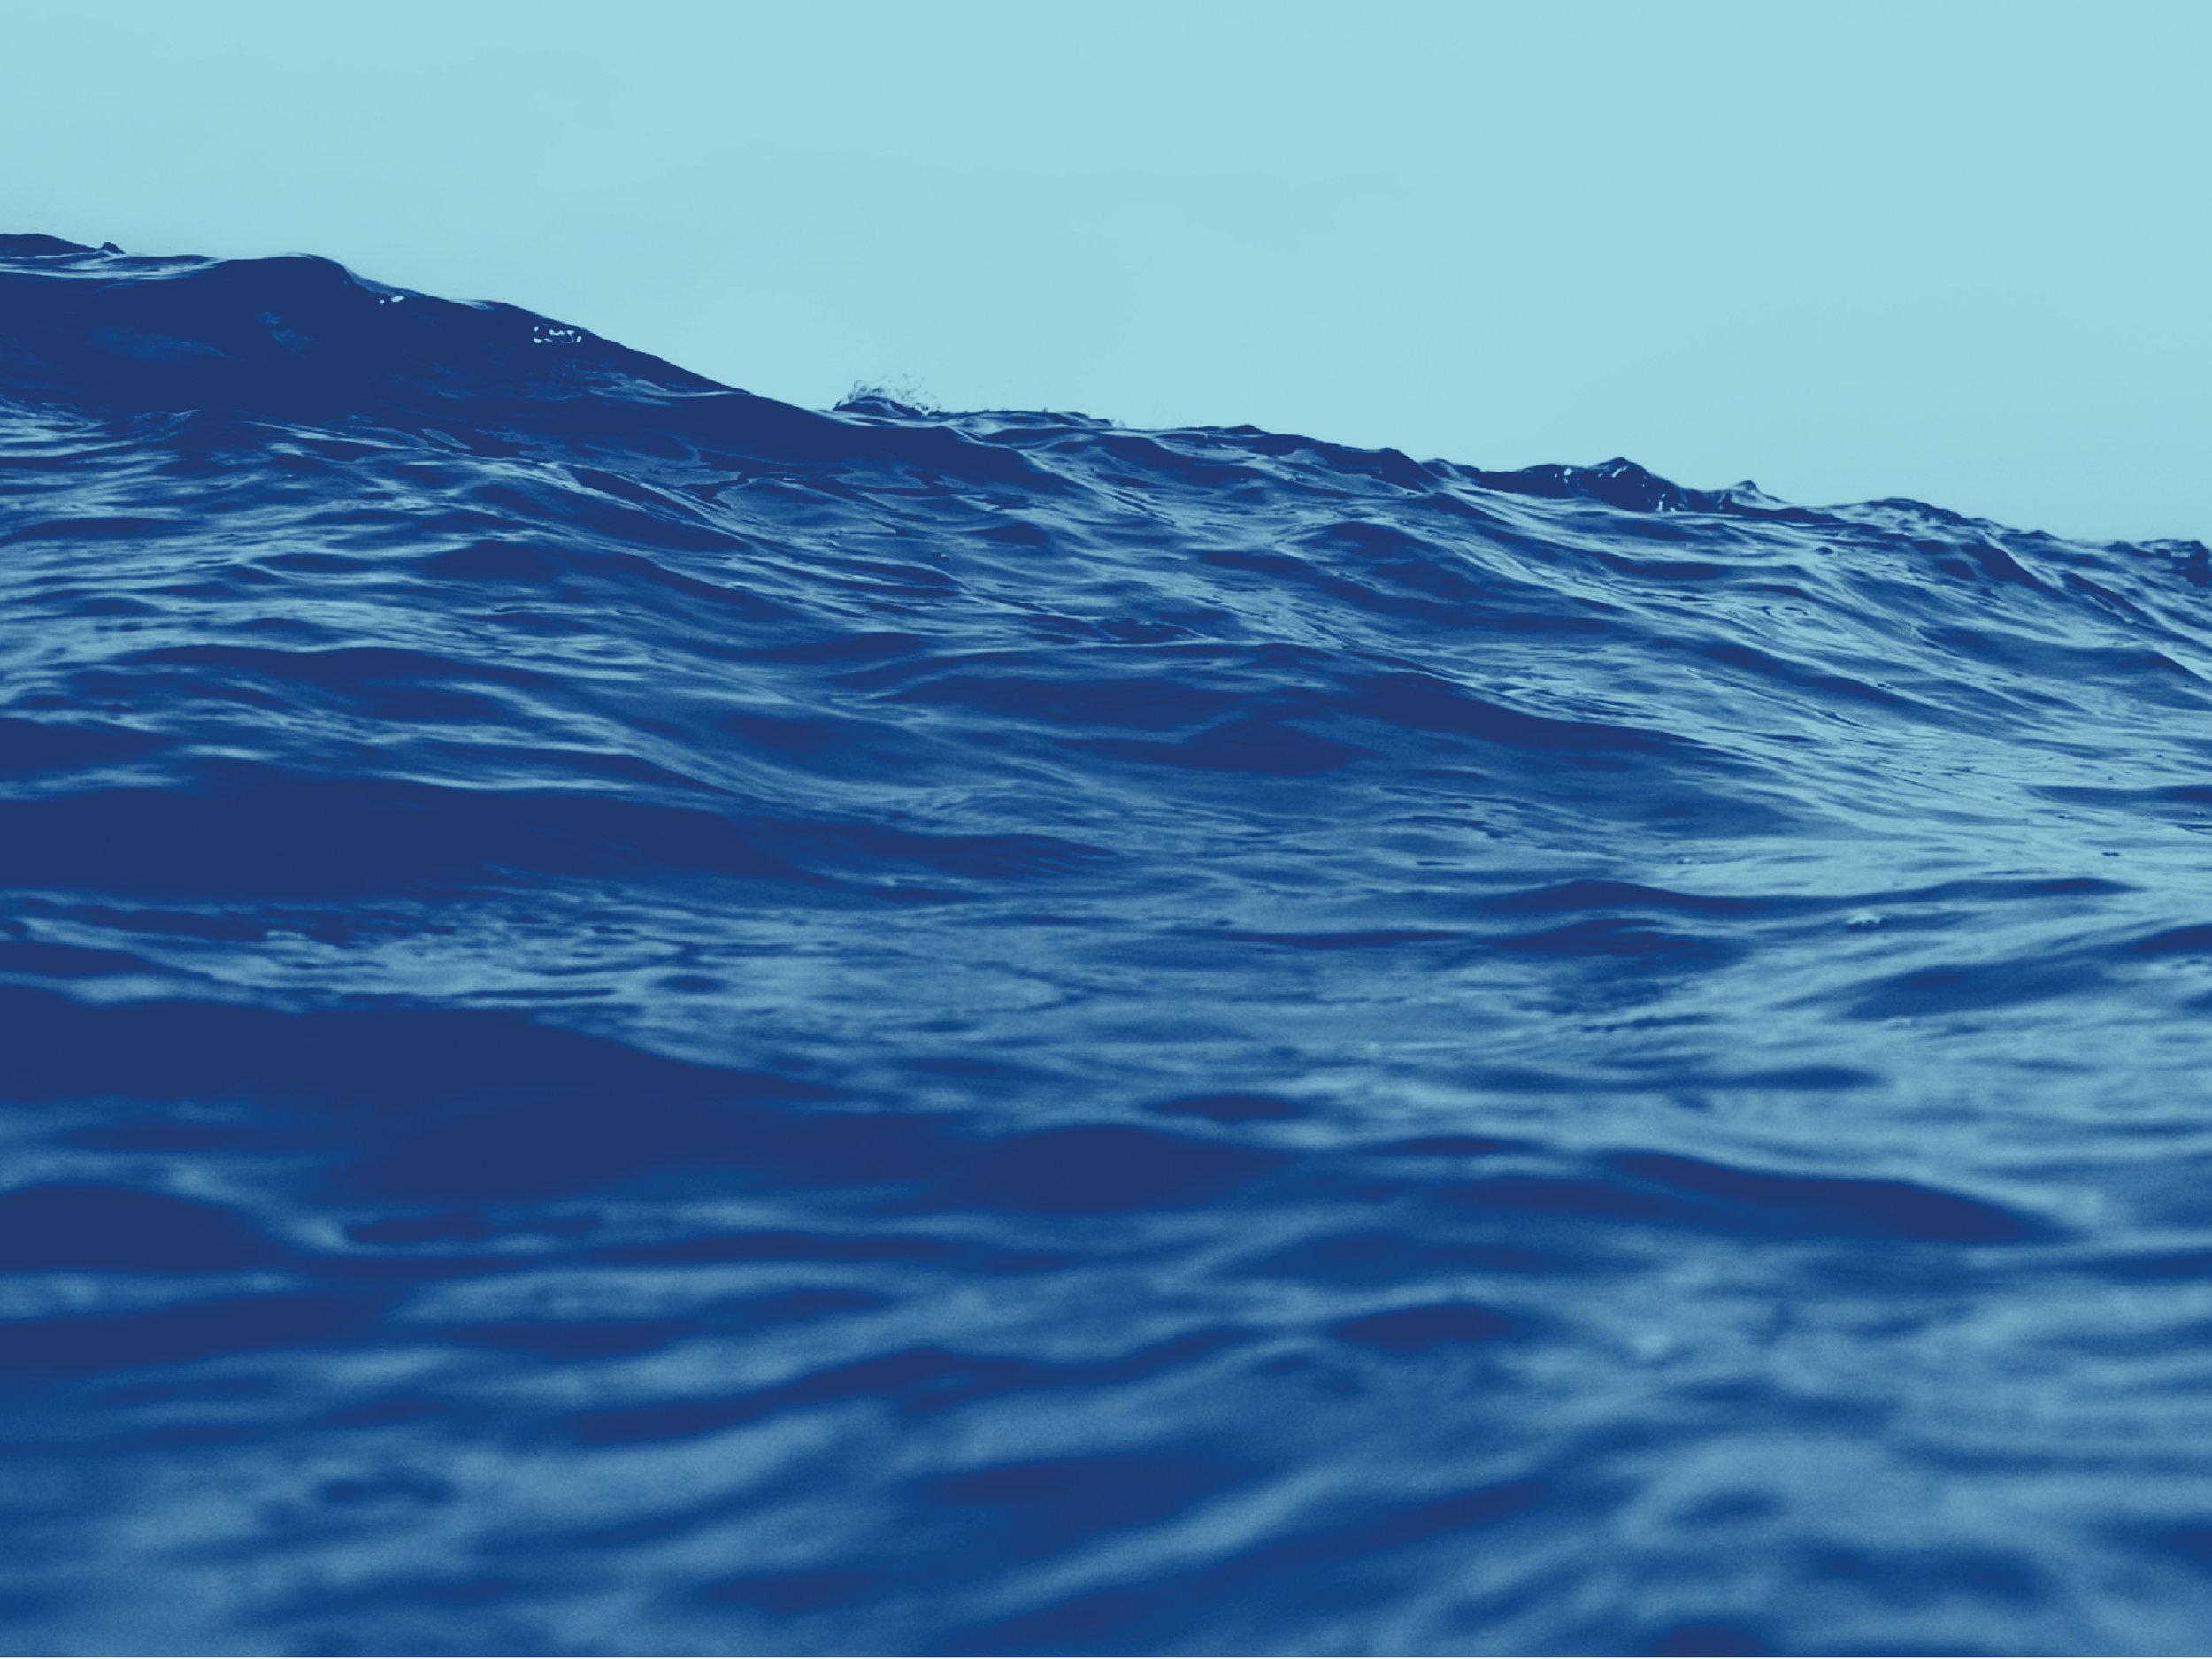 Shoreline - Marine insurance answers